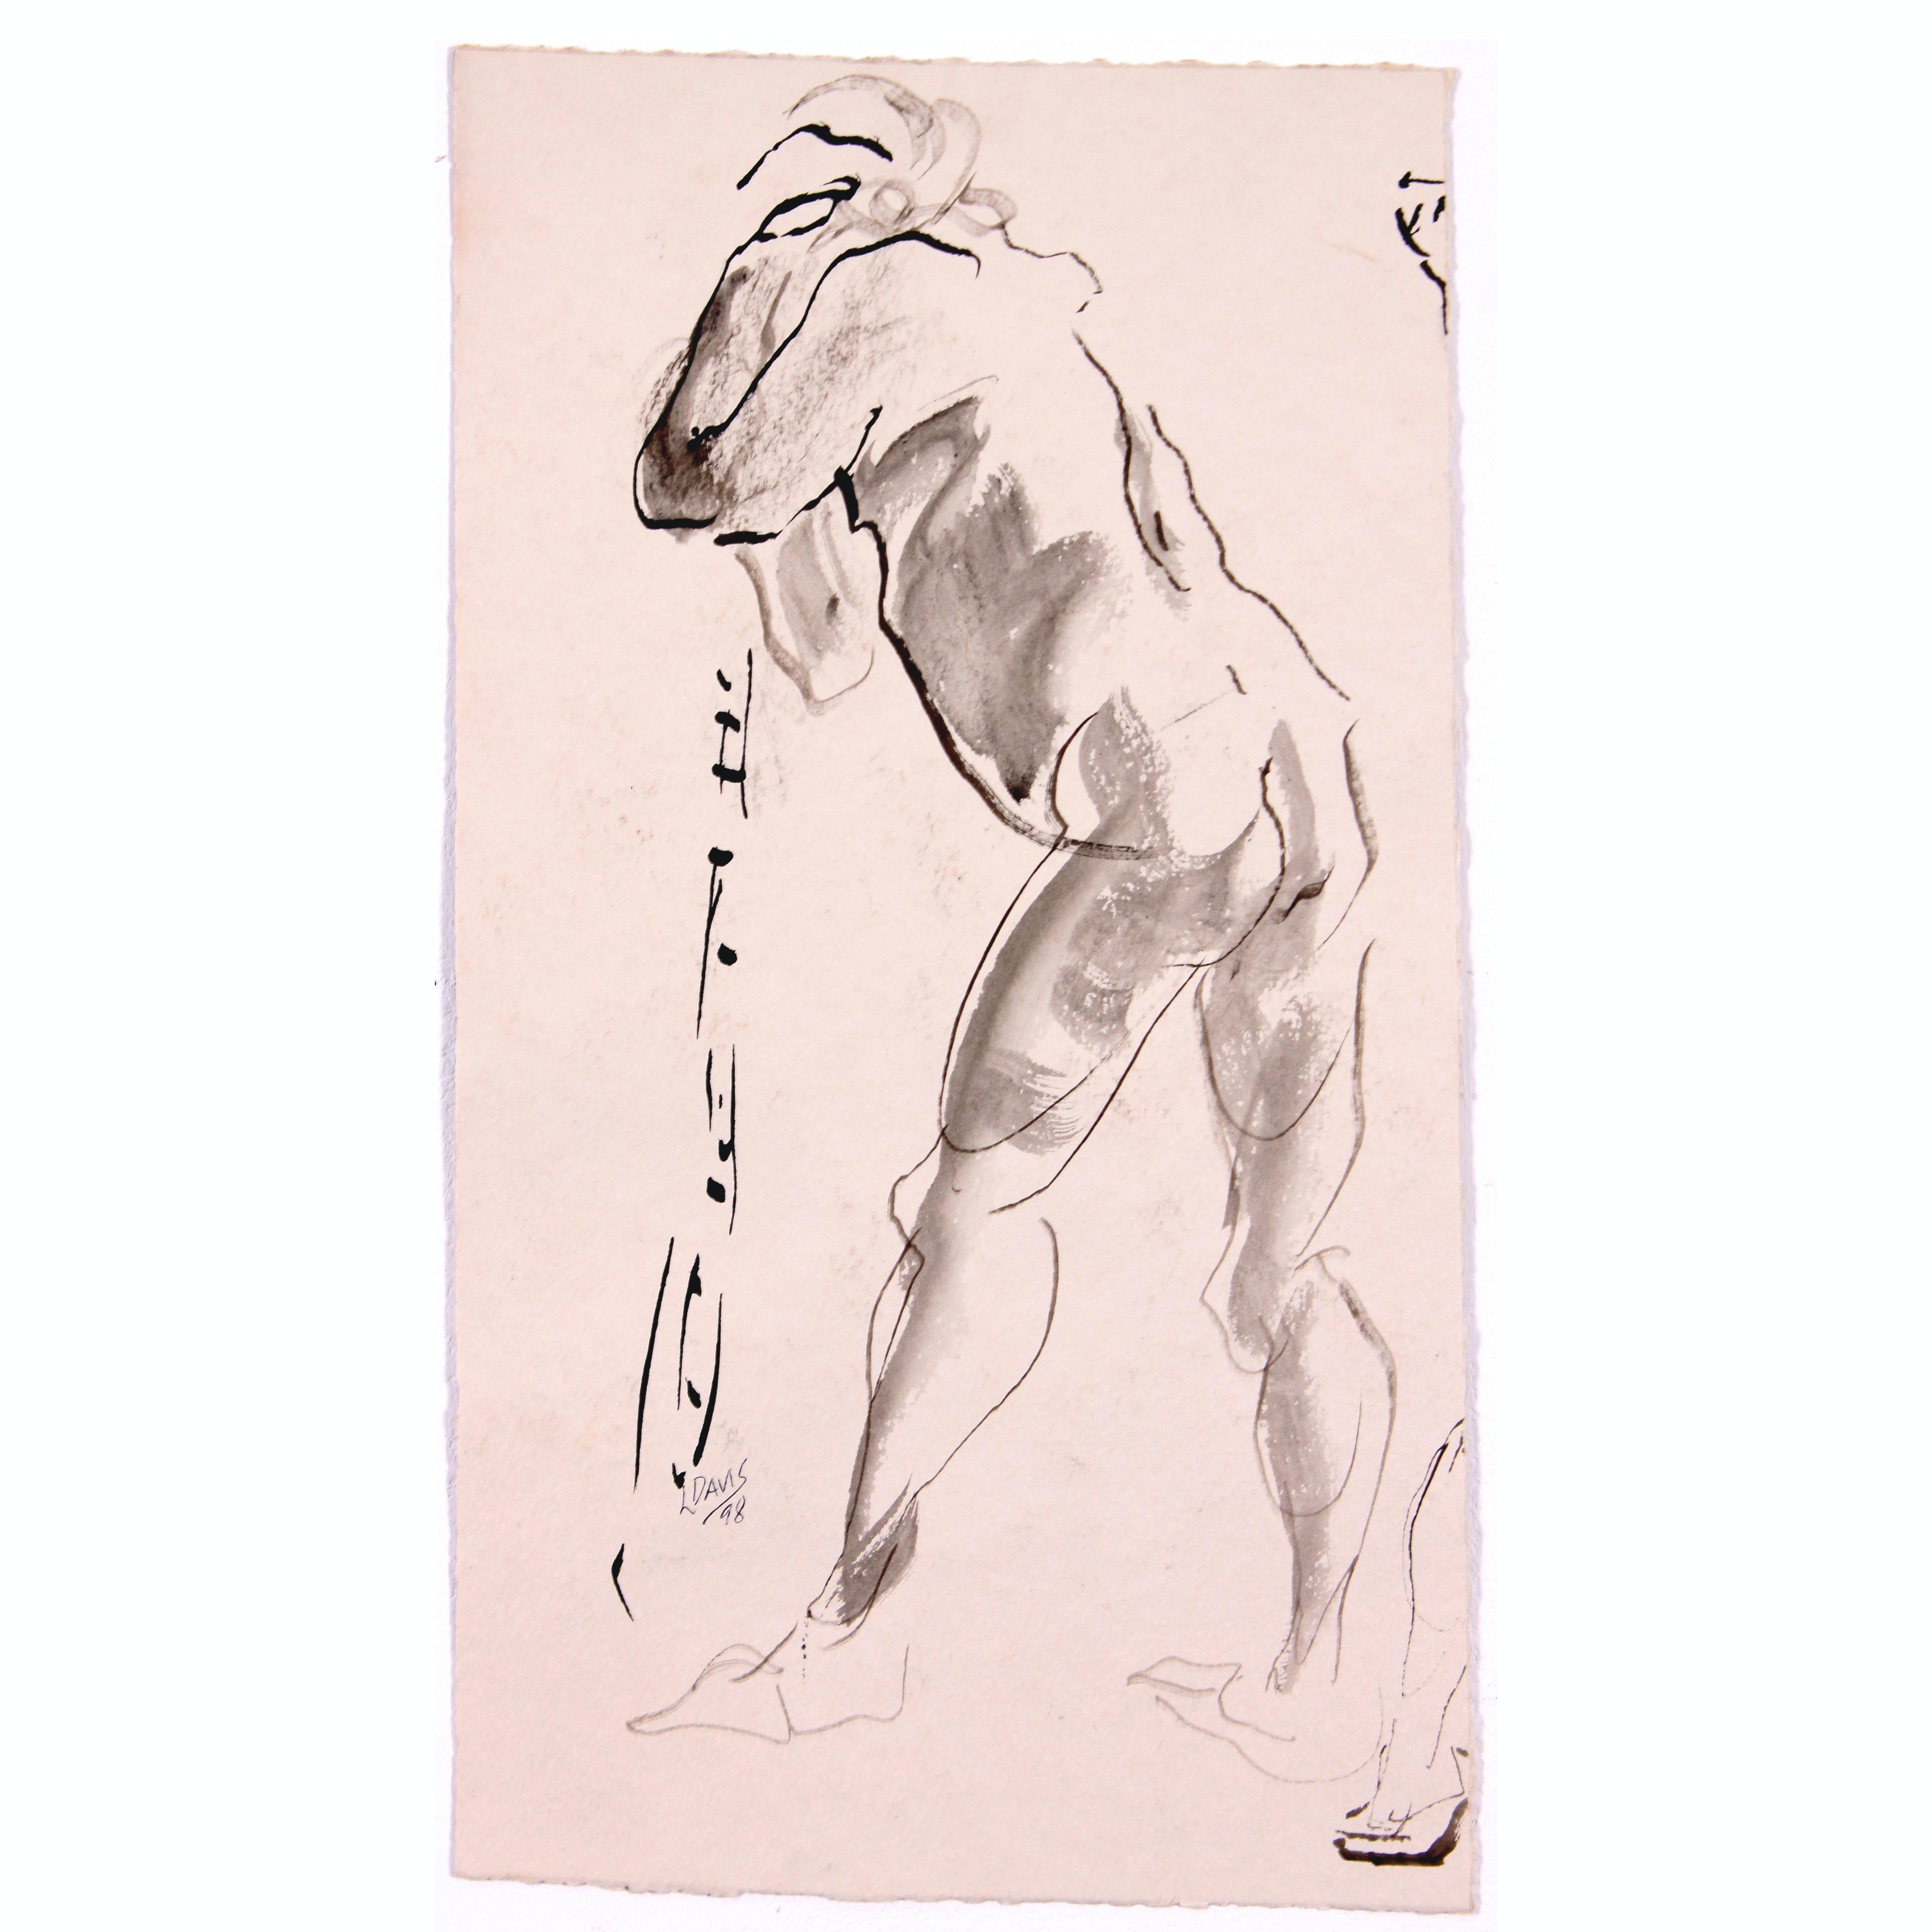 Original Abstract Figure Study by Lois Davis